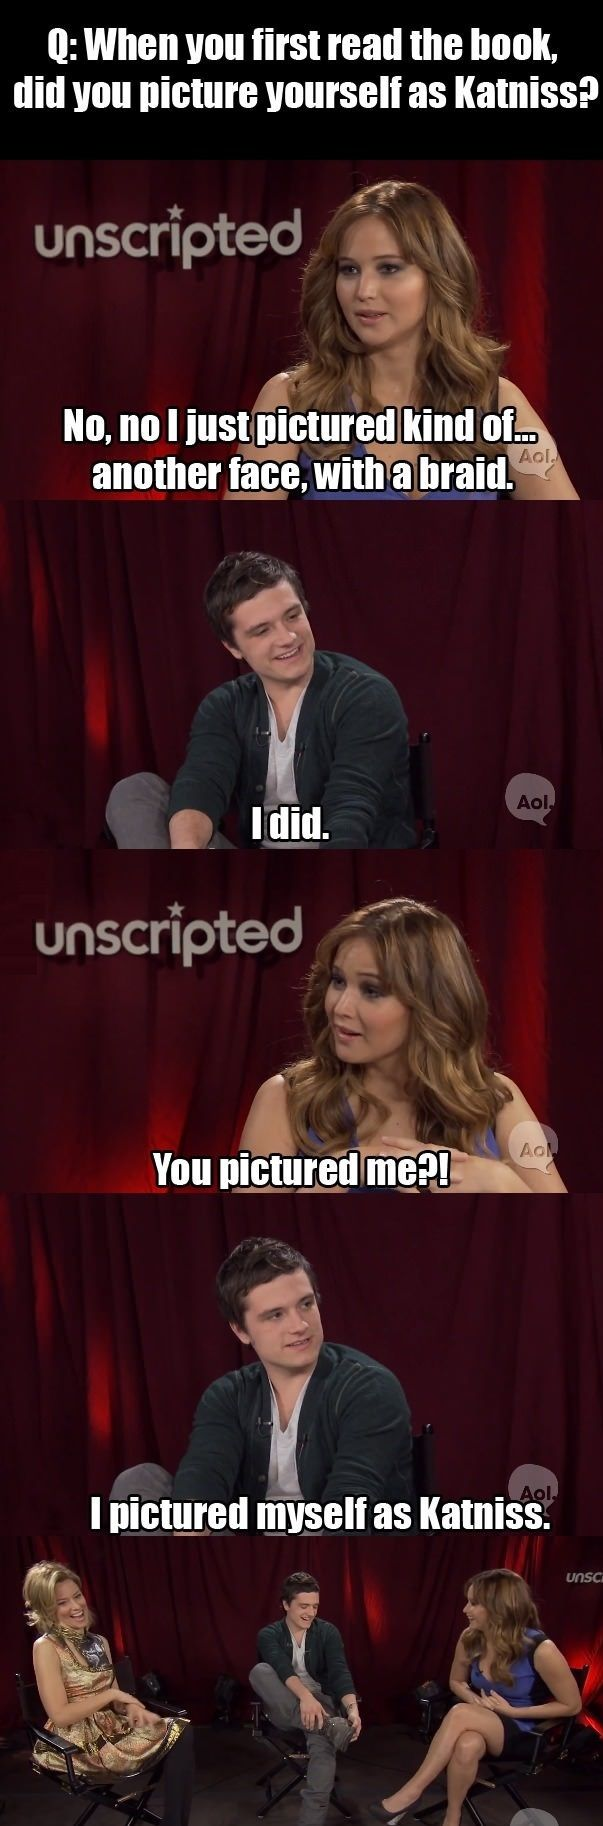 funny Jennifer Lawrence and Josh Hutcherson interview